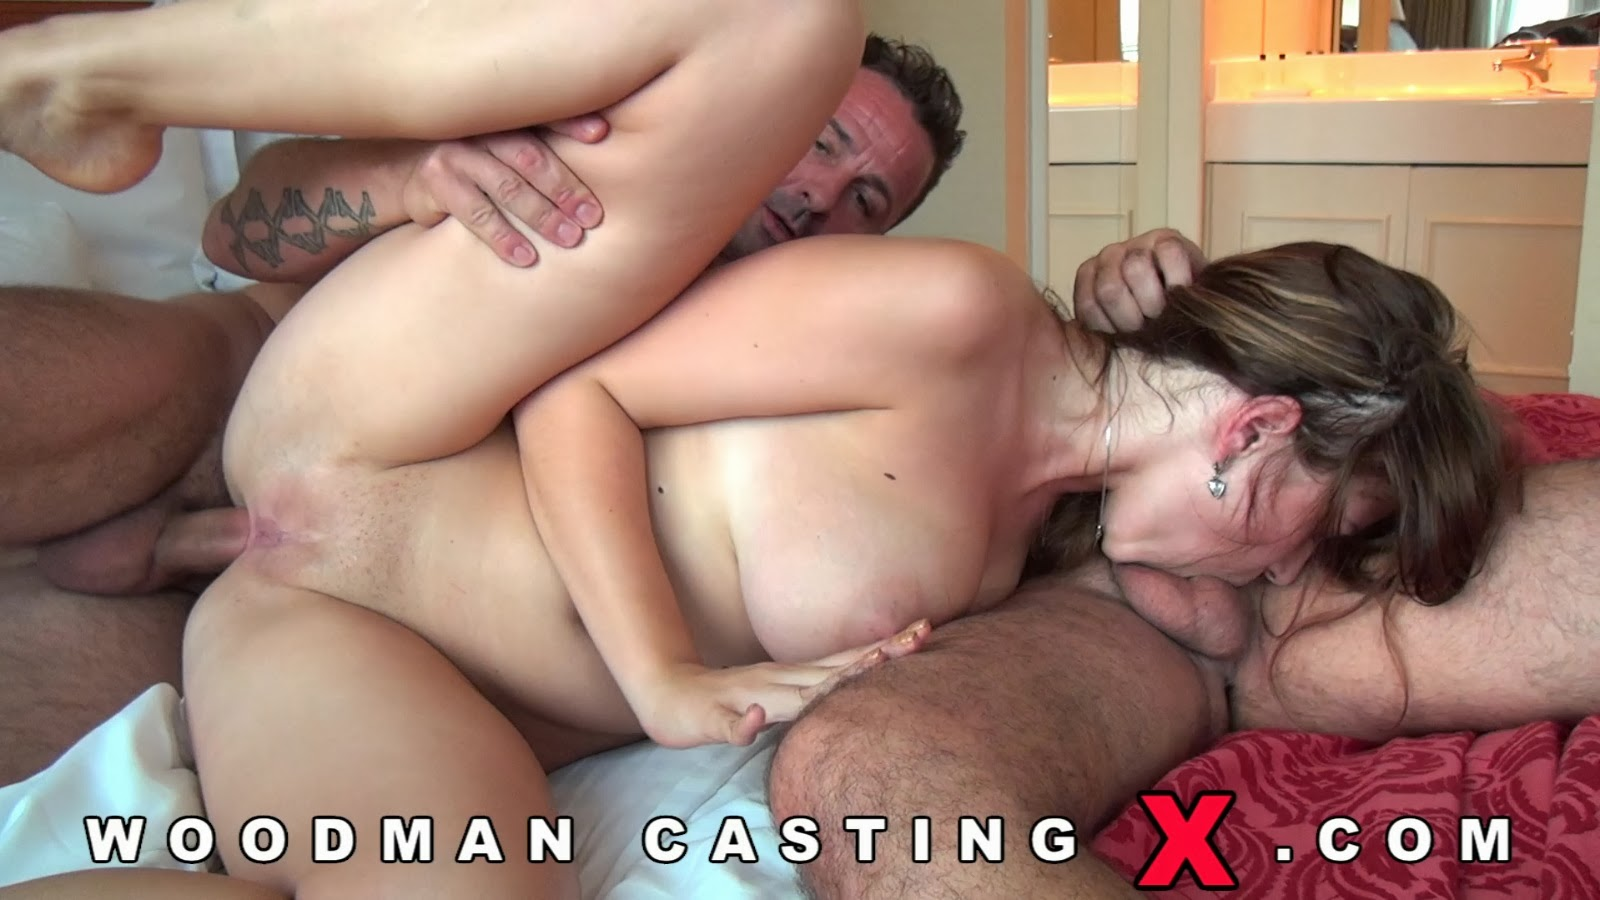 Фистинг на порно кастинге у вудмана 9 фотография